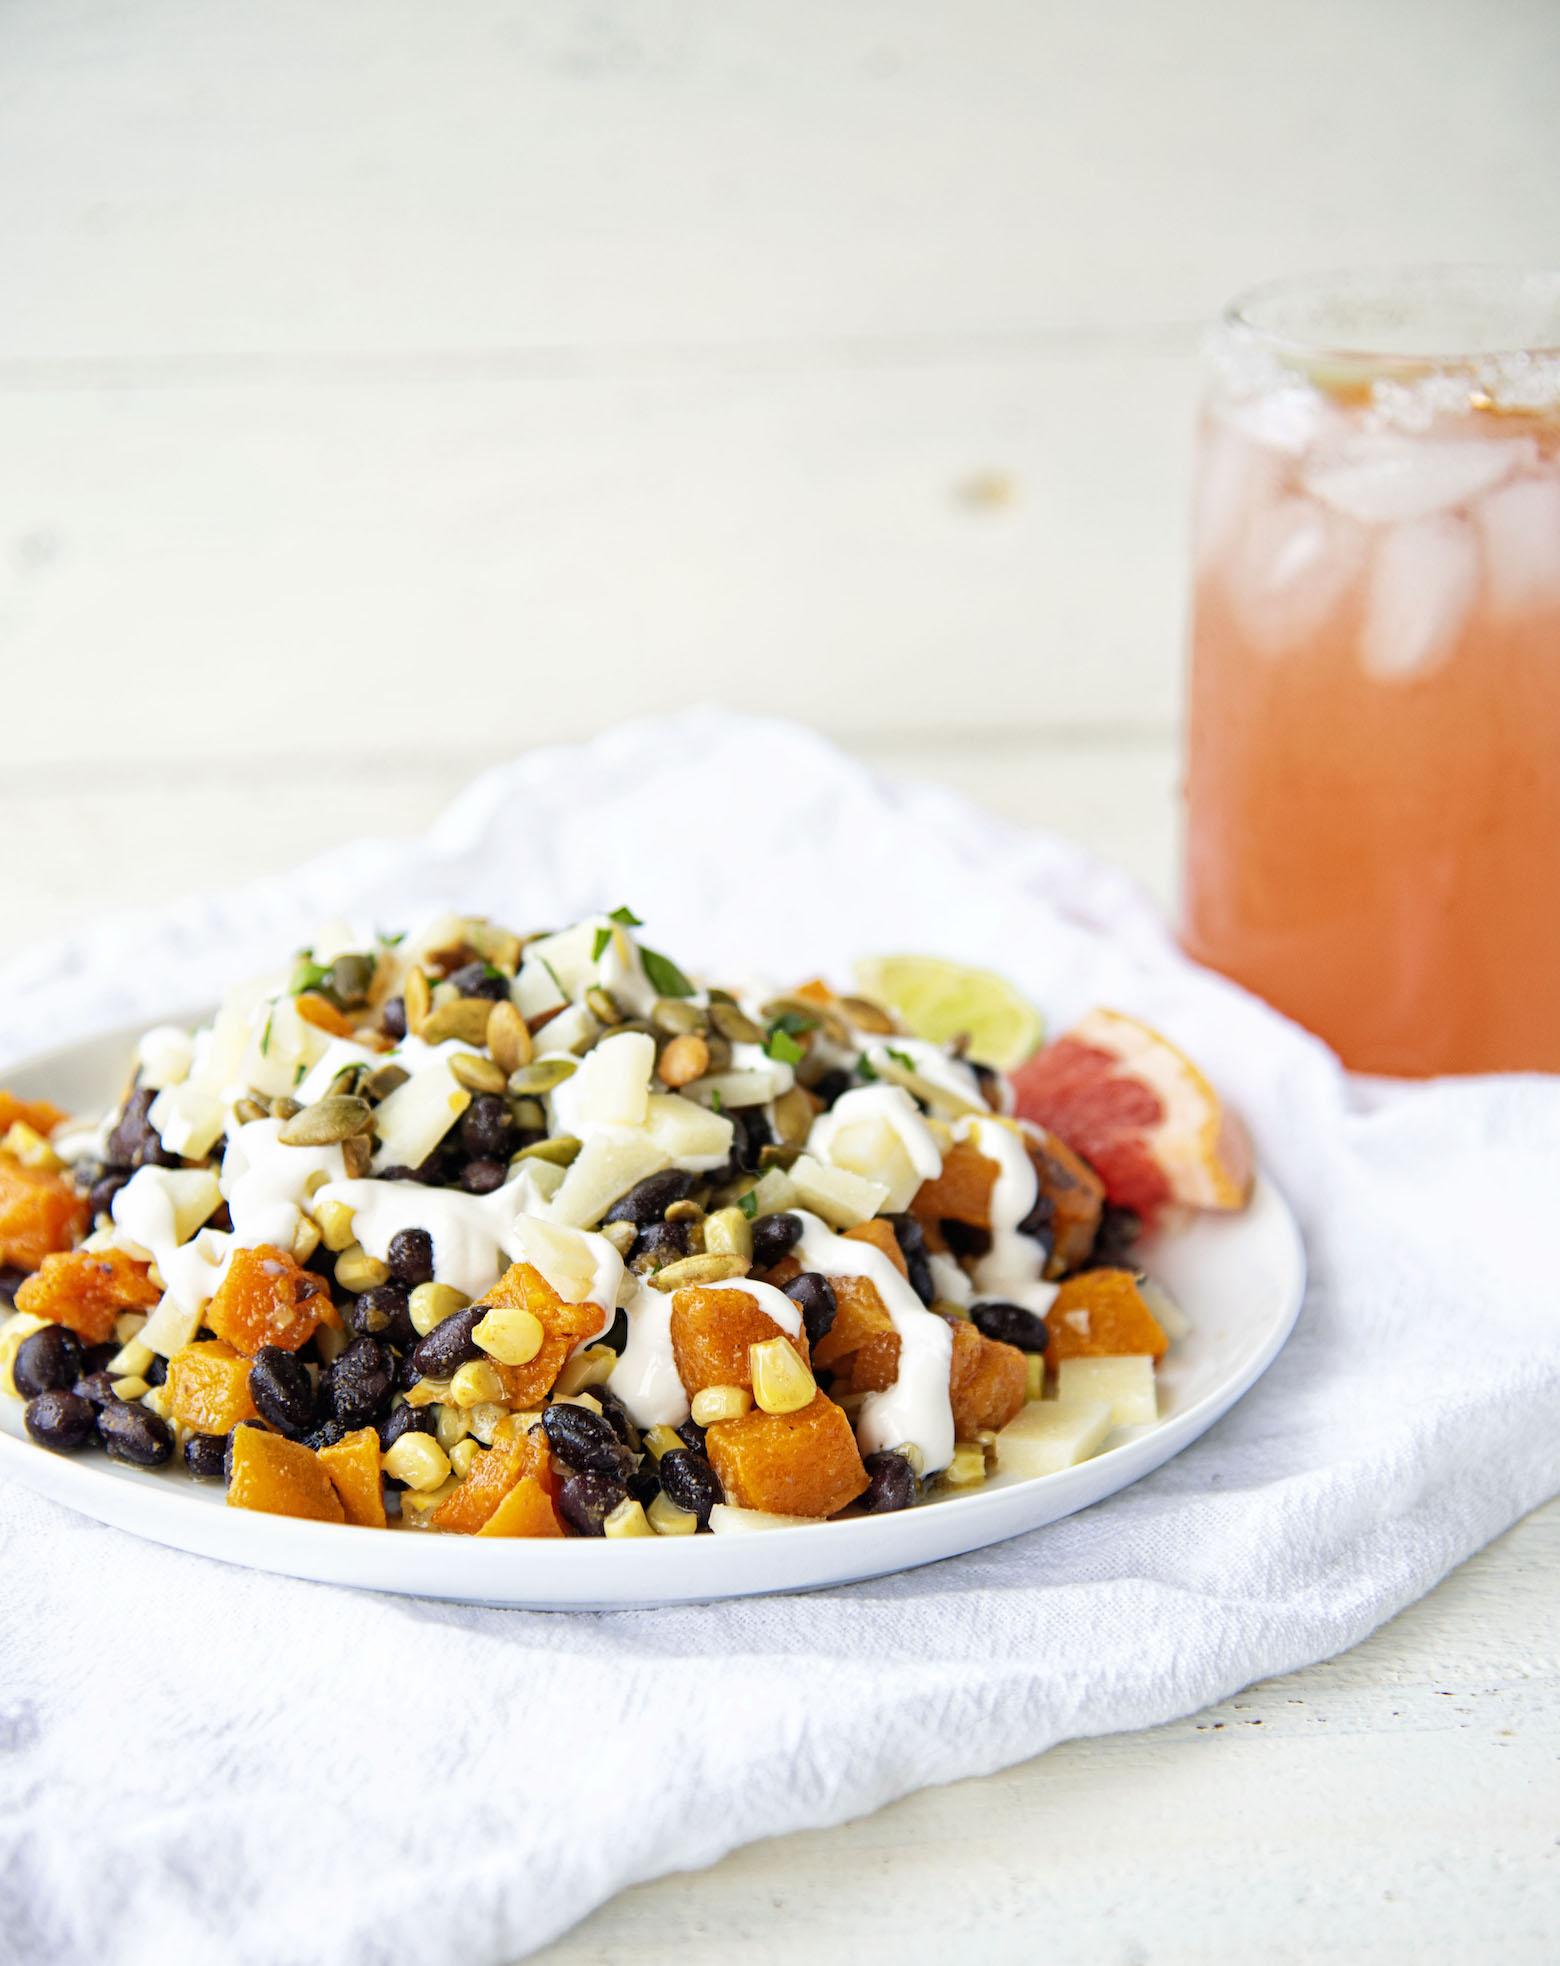 Black Bean Squash Corn Salad with Grapefruit Crema